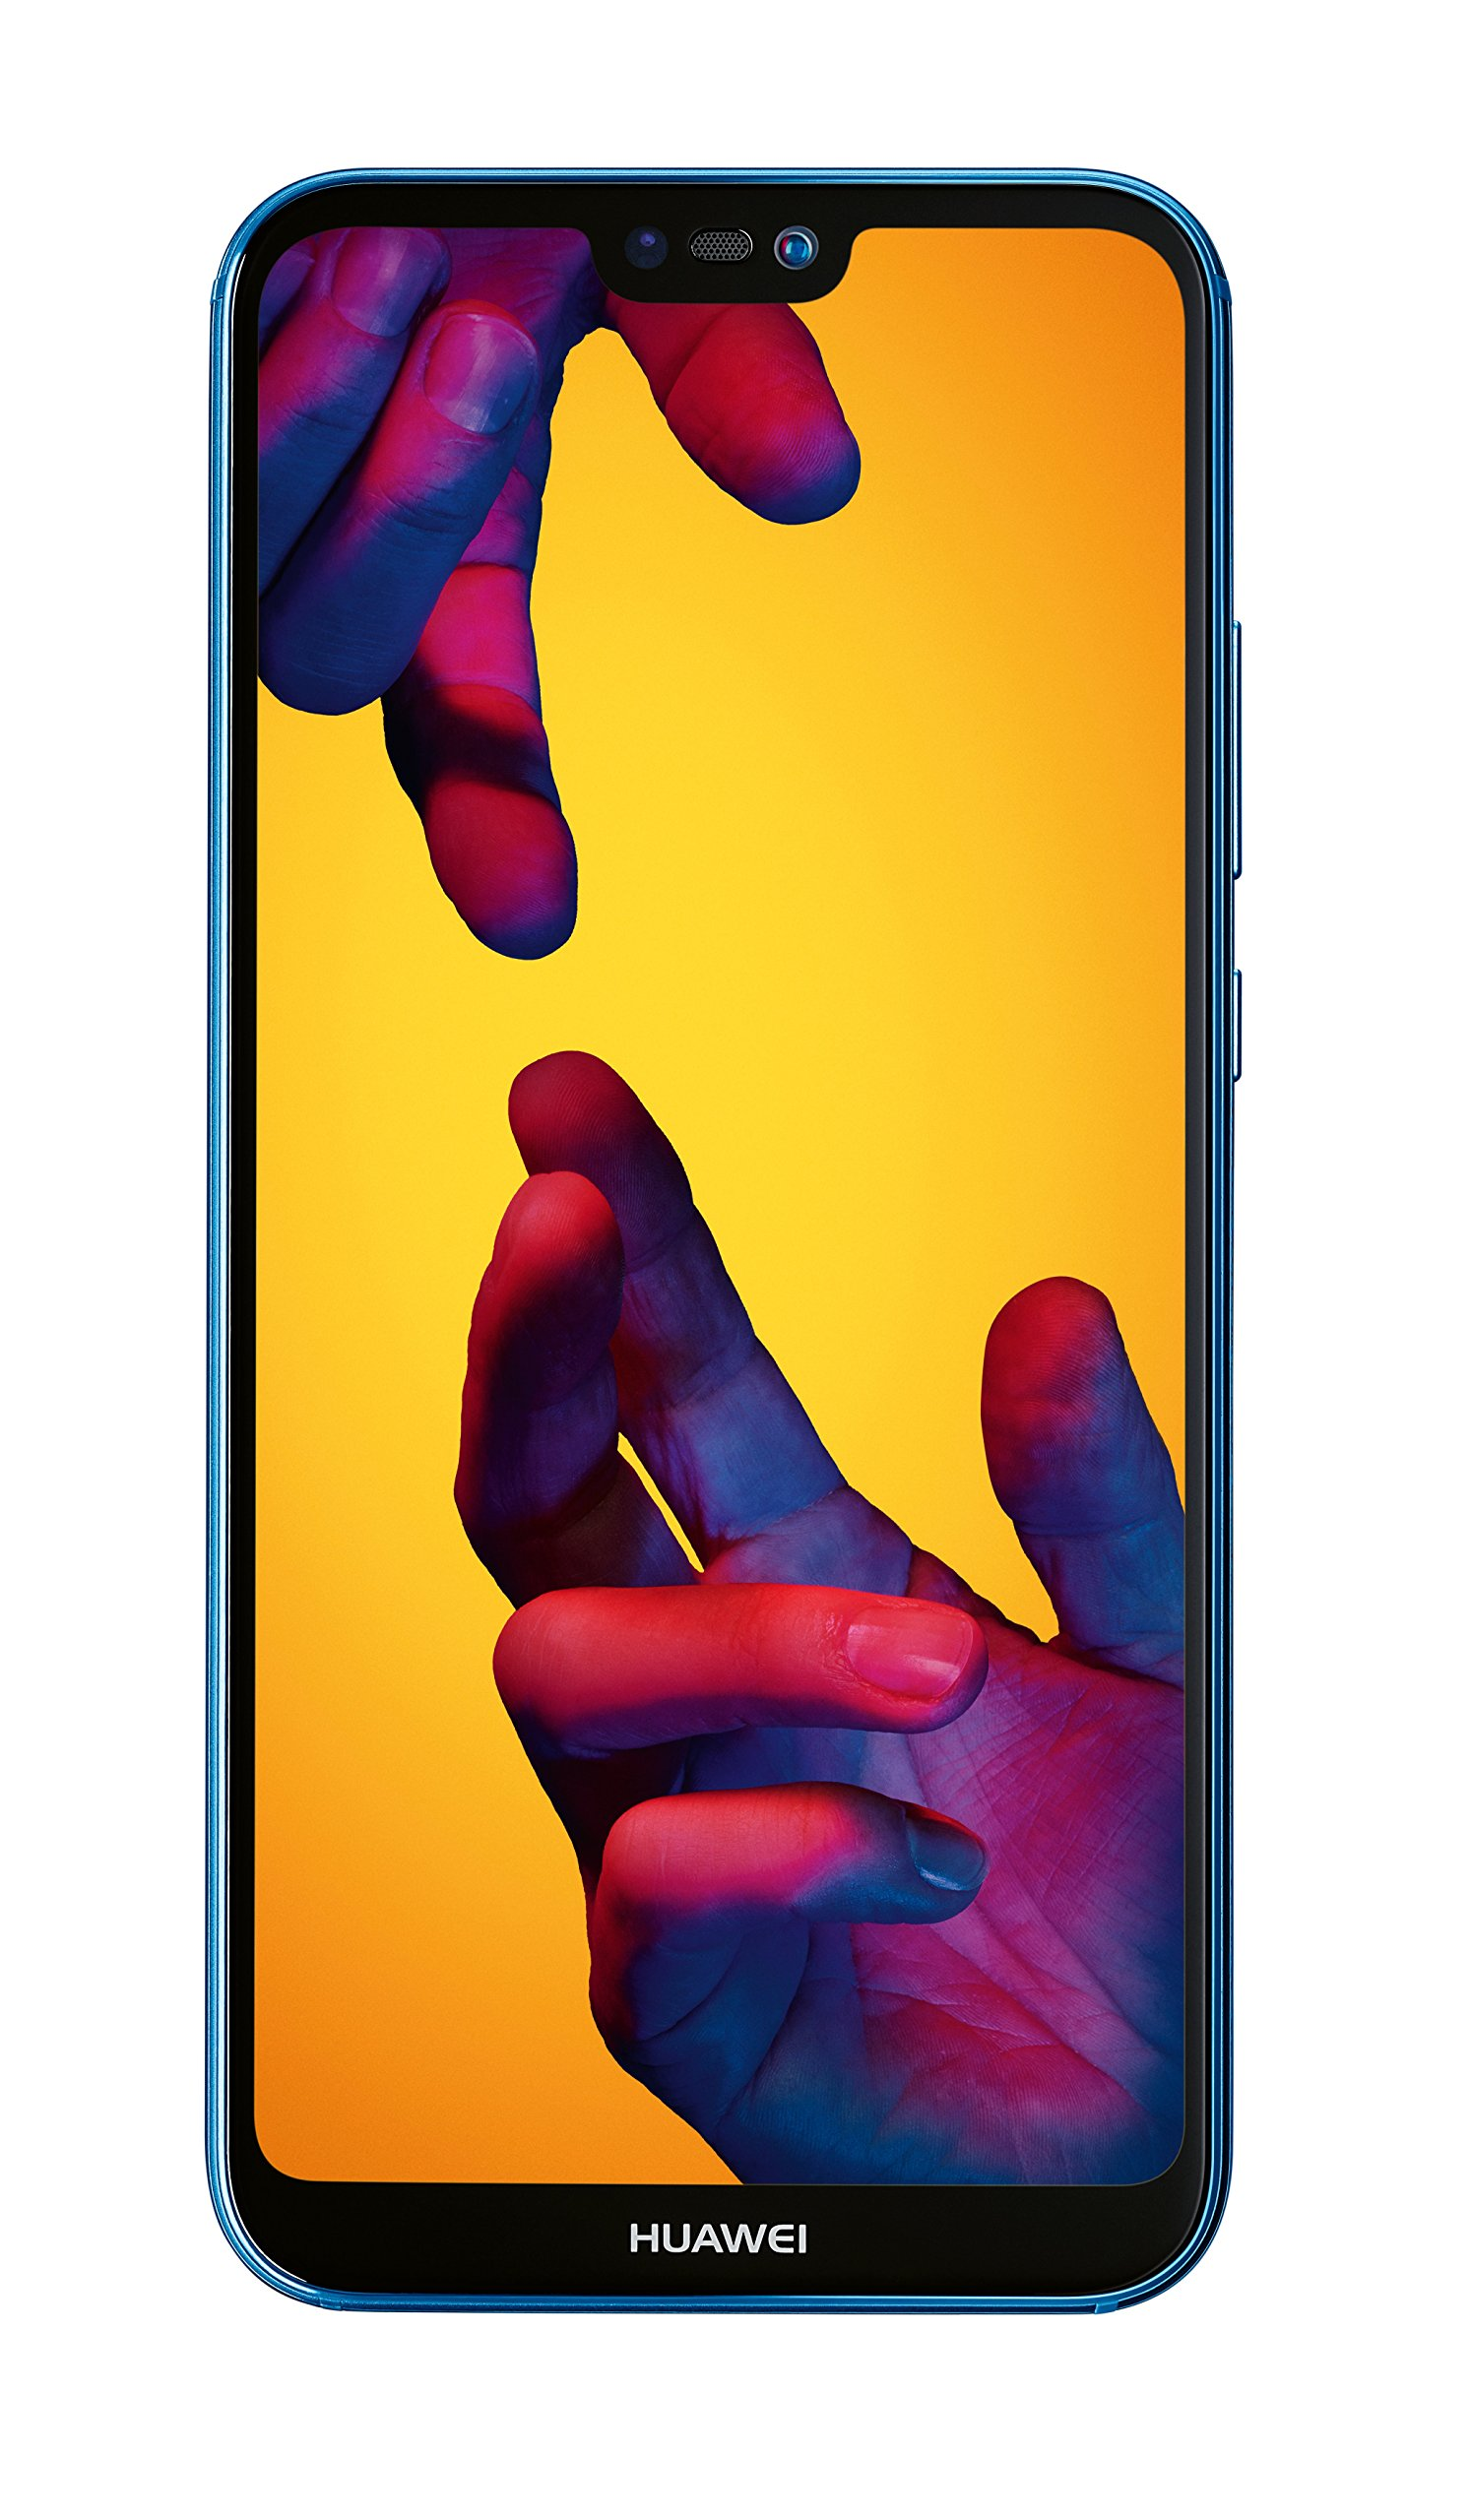 Huawei P20 Lite 64GB Dual-SIM Factory Unlocked 4G/LTE Smartphone- International Version - 81FetuuFurL - Huawei P20 Lite 64GB Dual-SIM Factory Unlocked 4G/LTE Smartphone- International Version